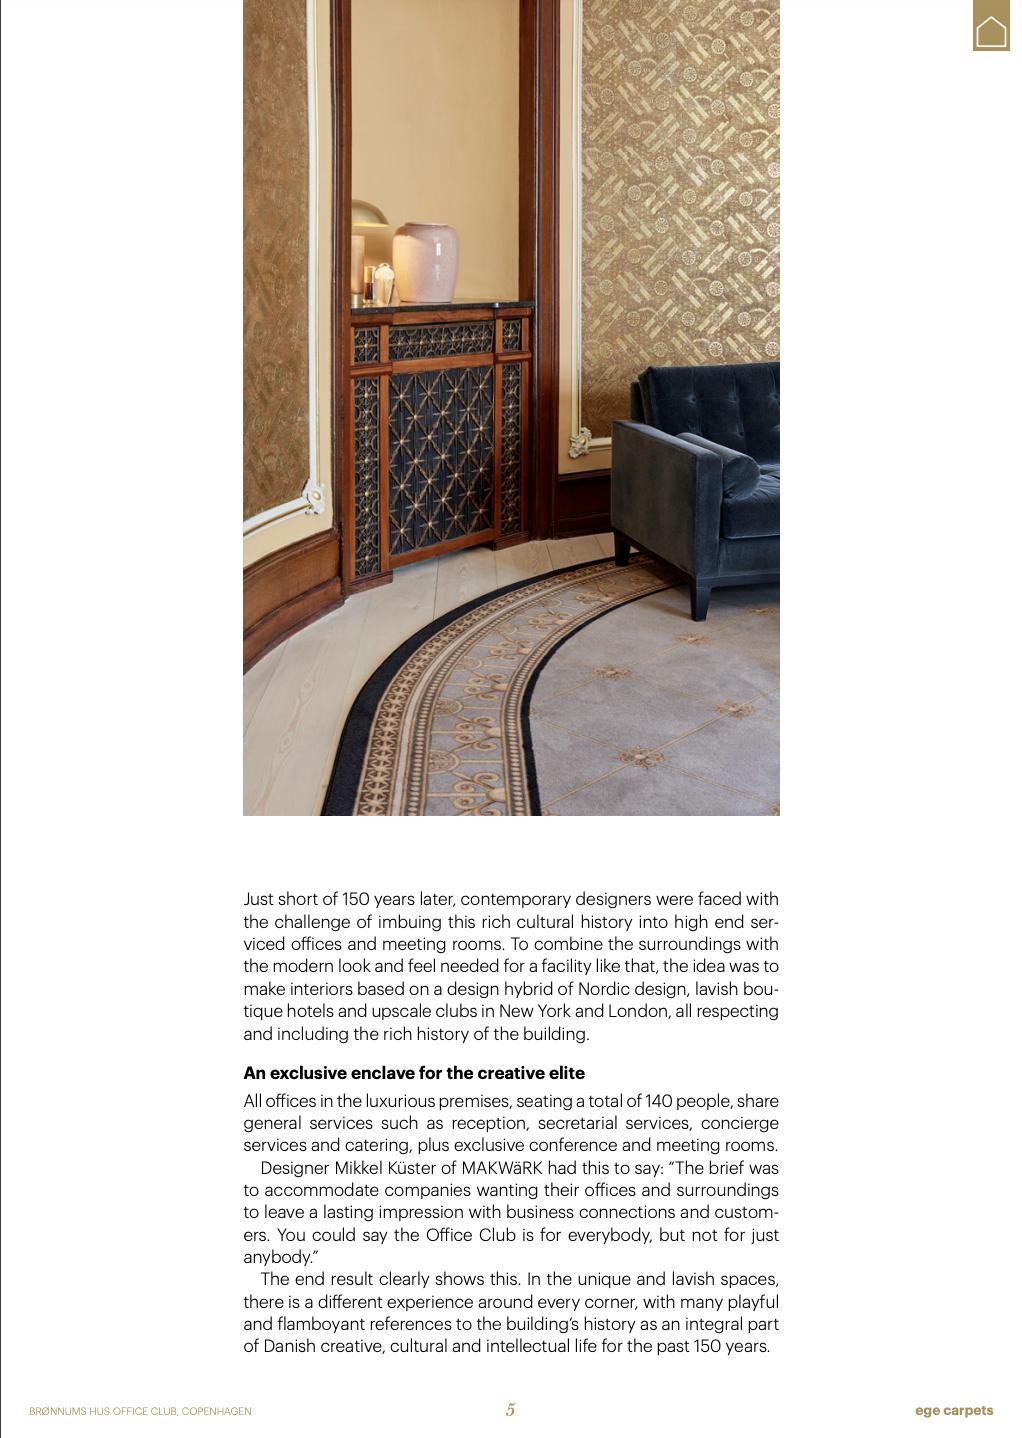 10 Amazing Carpet Cases We Love - 5 - en